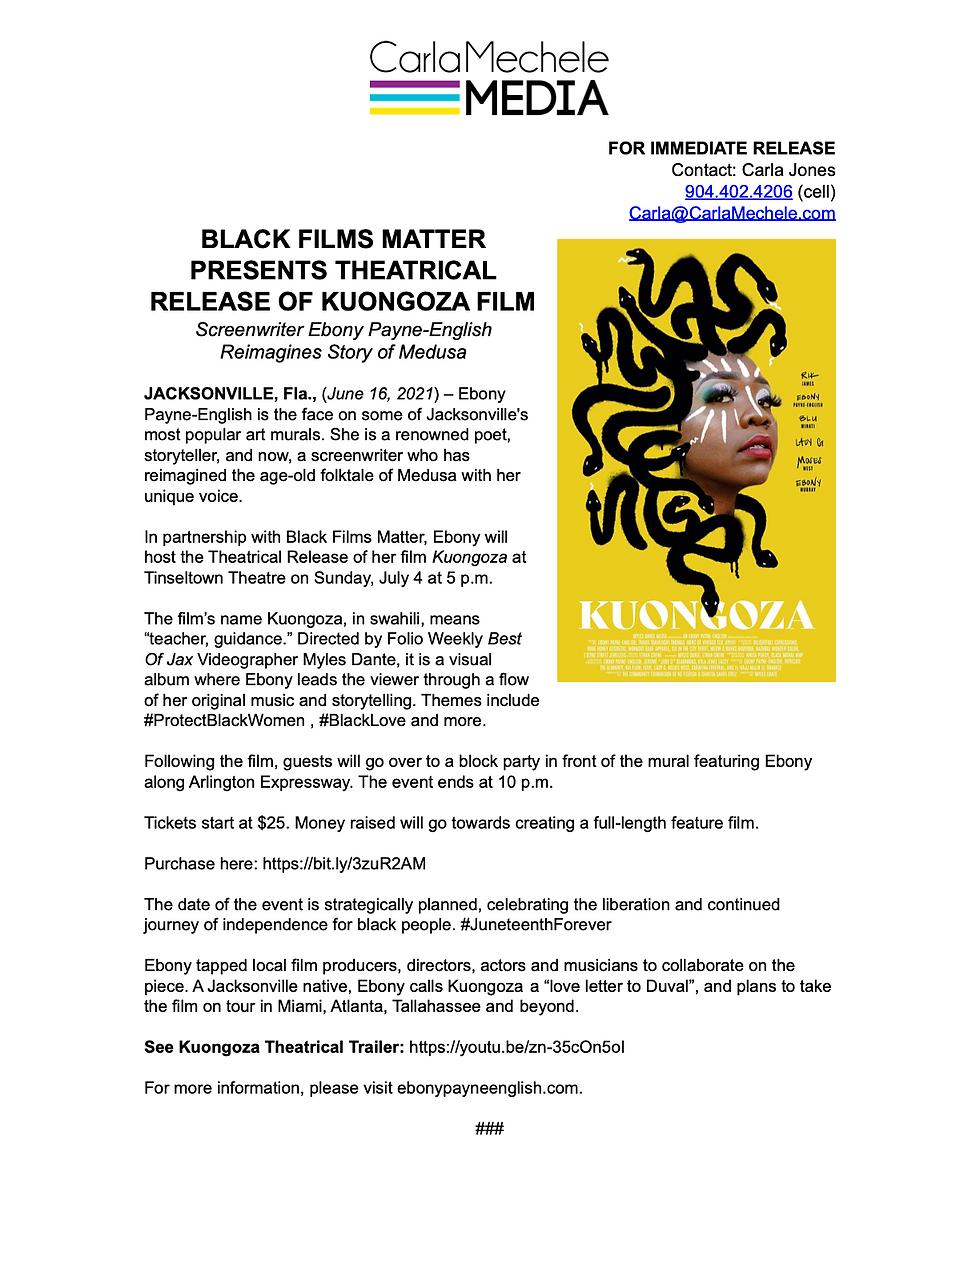 Ebony Payne English - Kuongoza Film  (1)